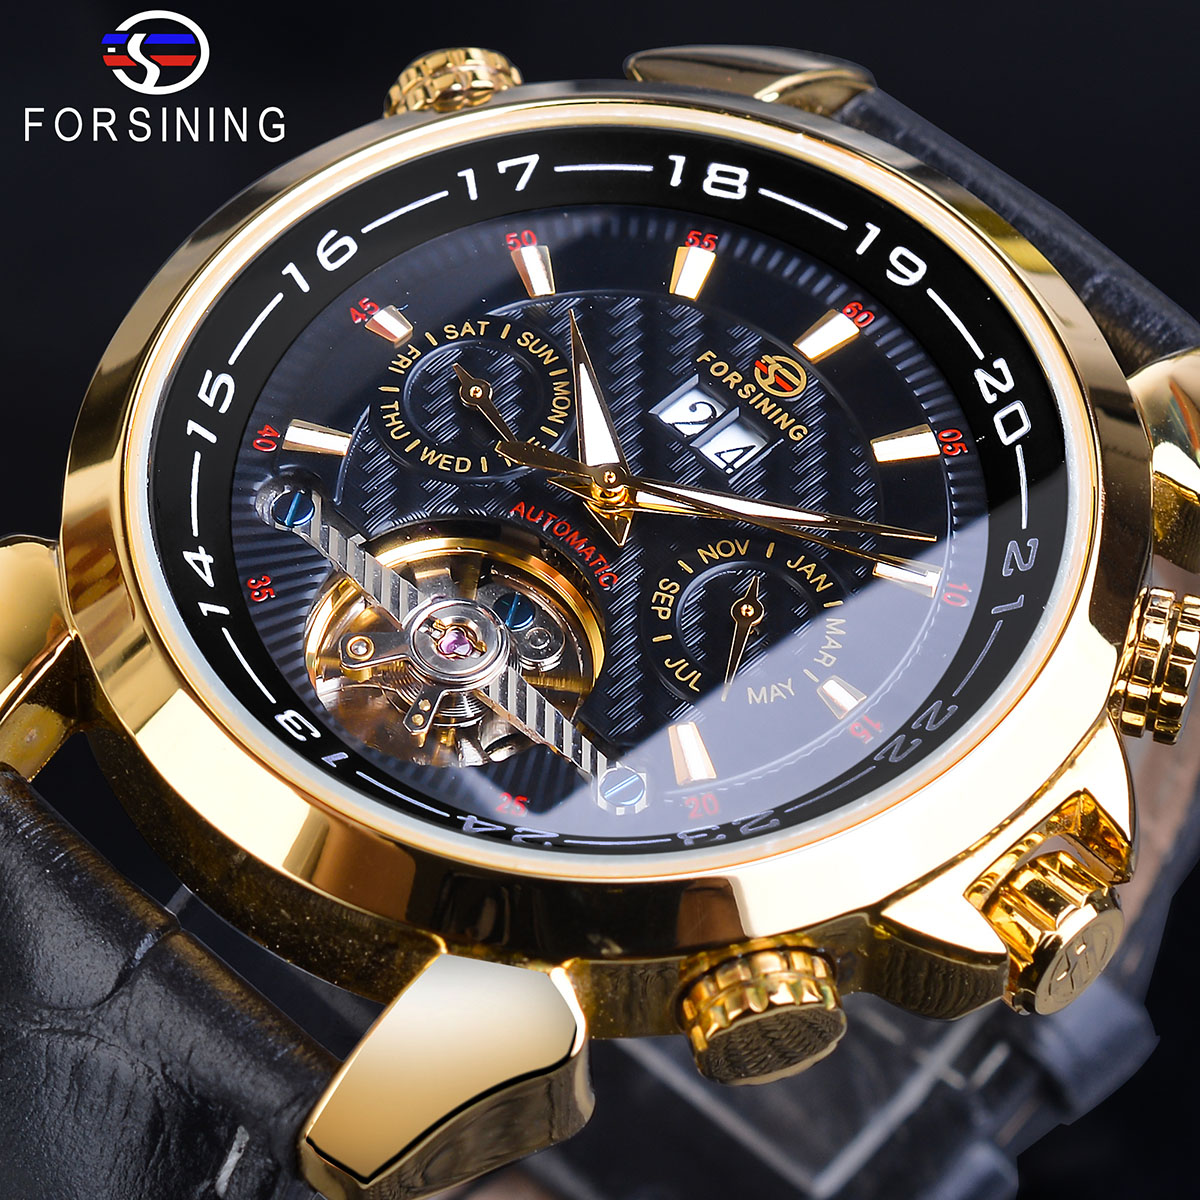 Forsining Tourbillon Mechanical Watch Male Automatic Calendar Genuine Leather Band Dress Wristwatches Clock Relogio Montre Homme